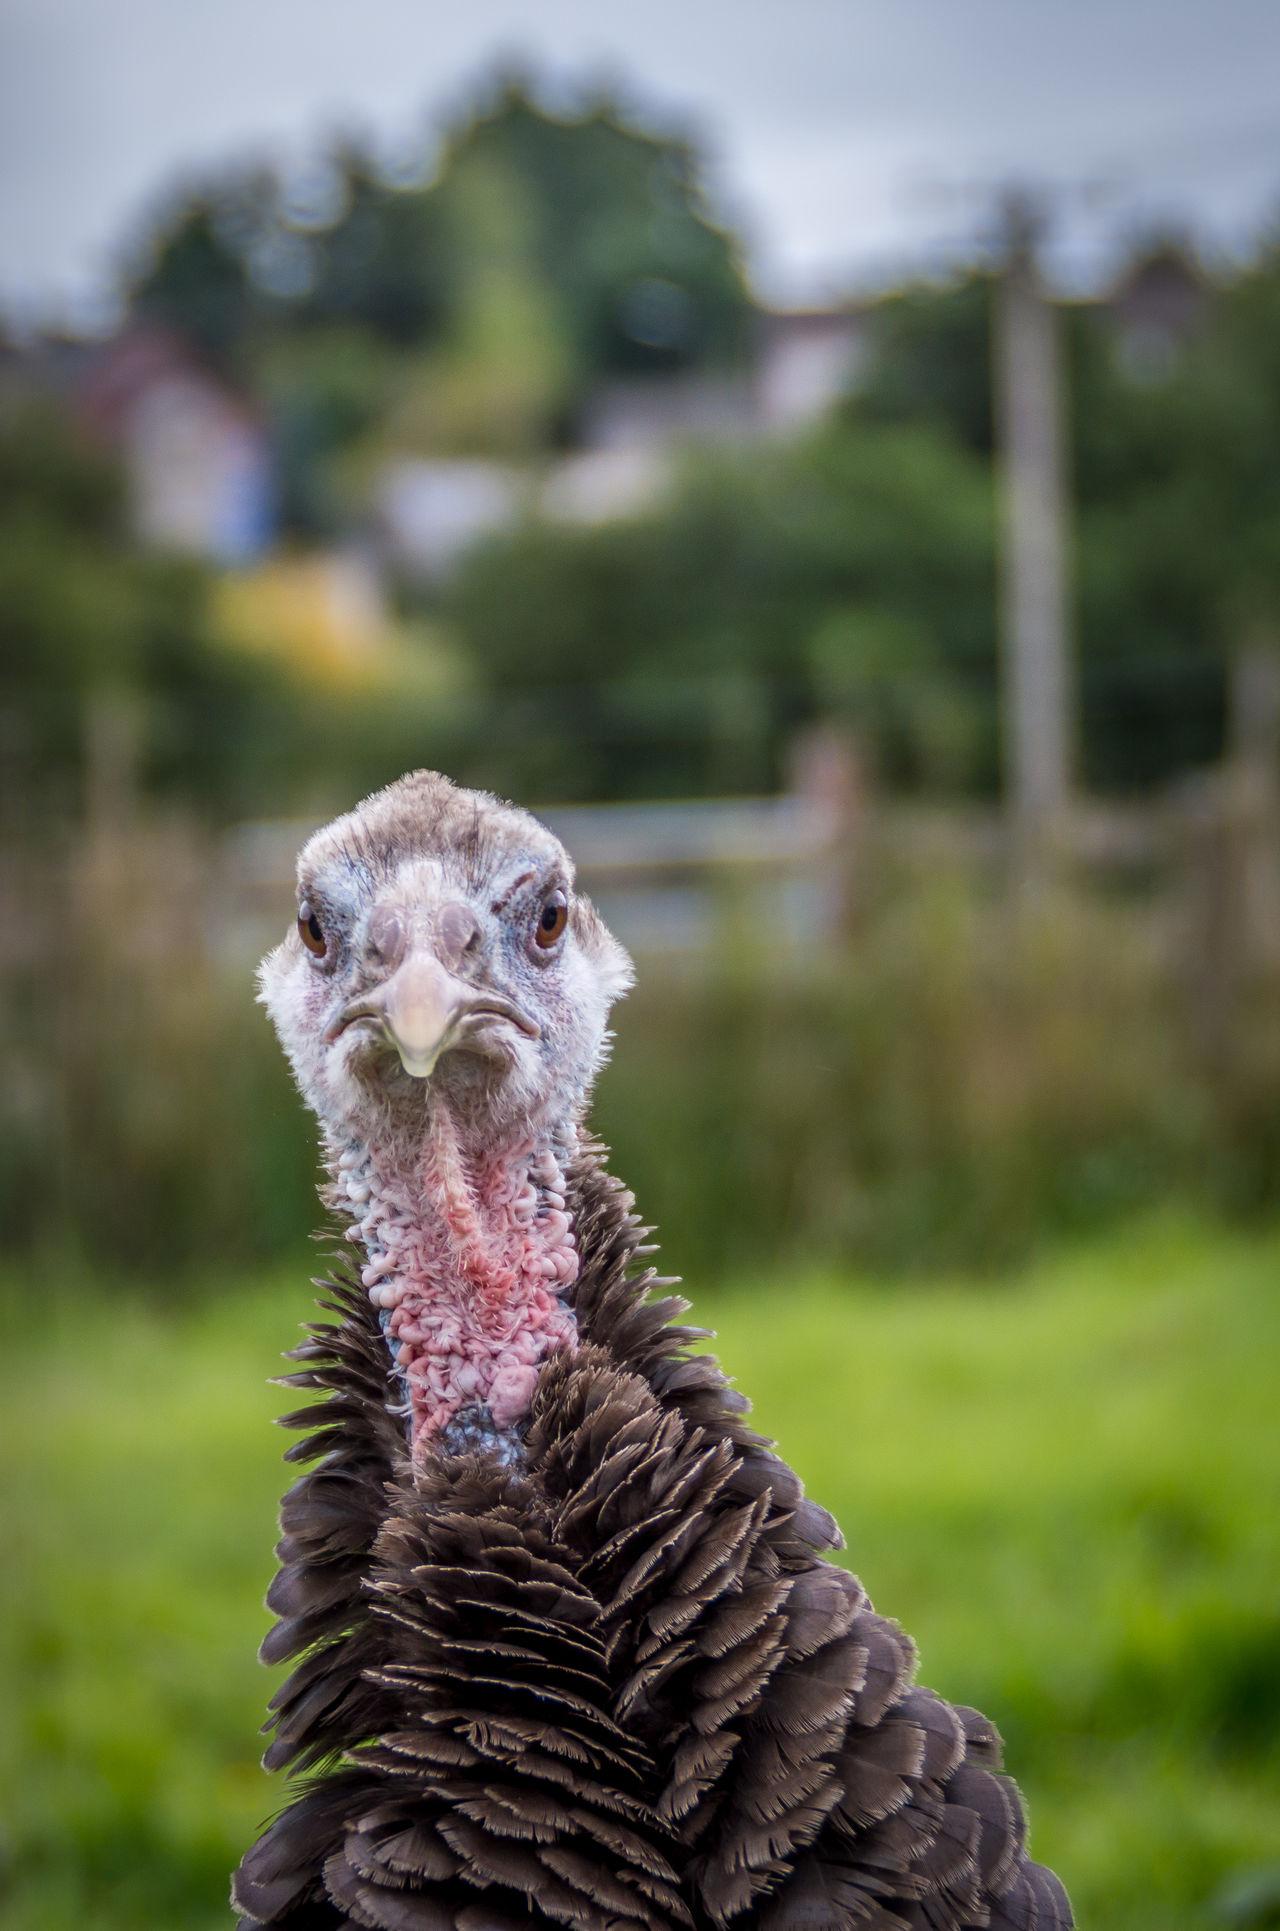 Animal Close-up Co. Kildare Curiosity Depth Of Field Ireland🍀 Nature Outdoors Selective Focus Turkey Wildlife